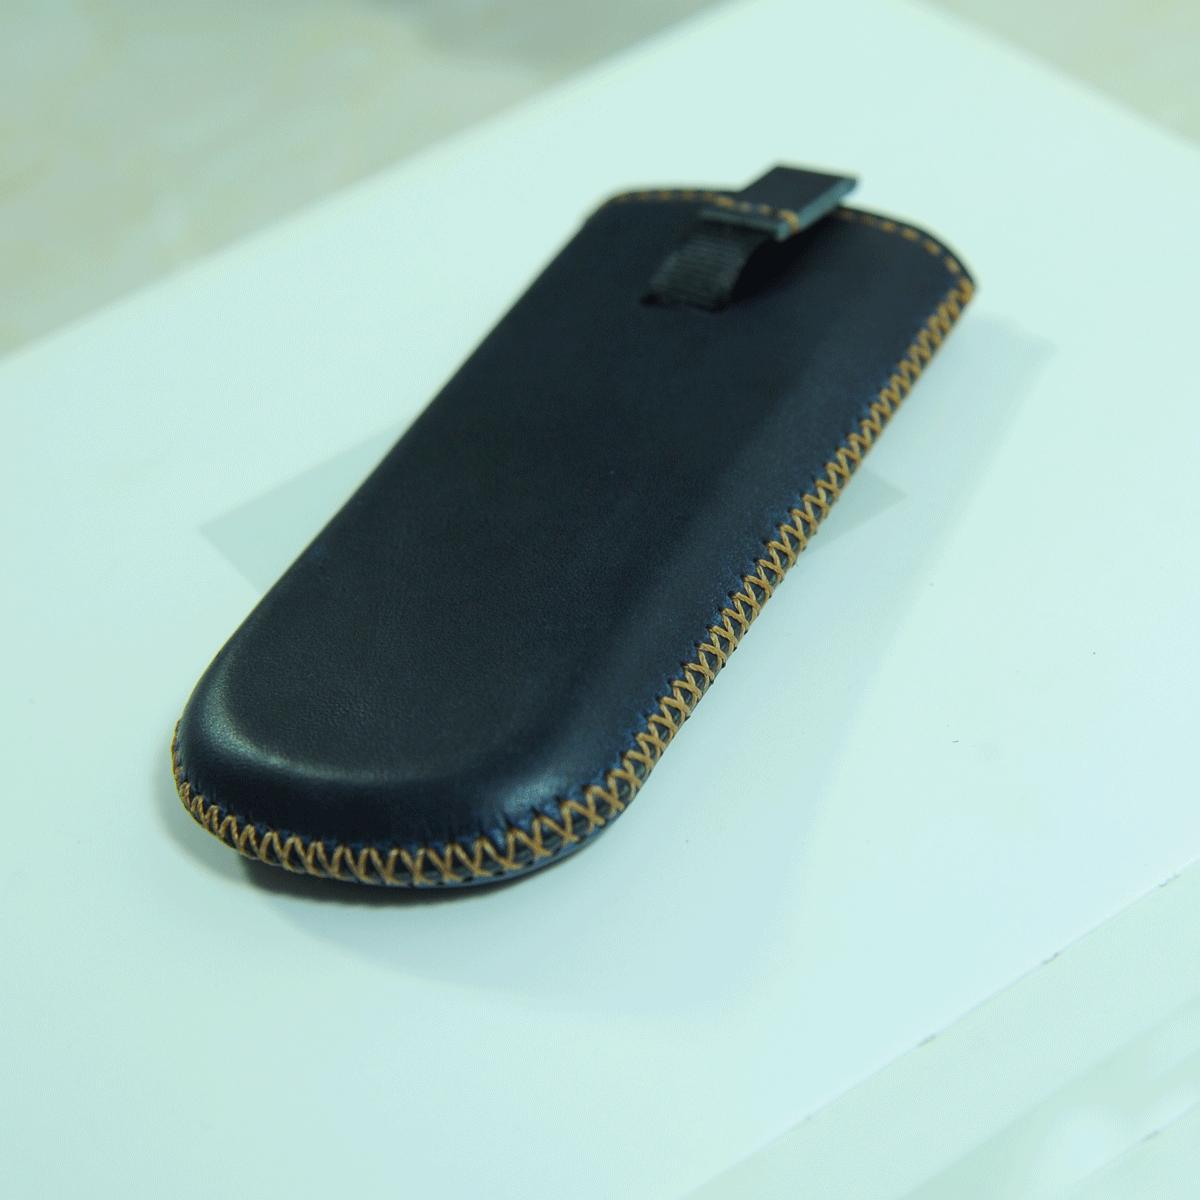 Bao da sáp xanh handmade cho điện thoại Nokia 6700 8800 - Bao da Mino Crafts VI281